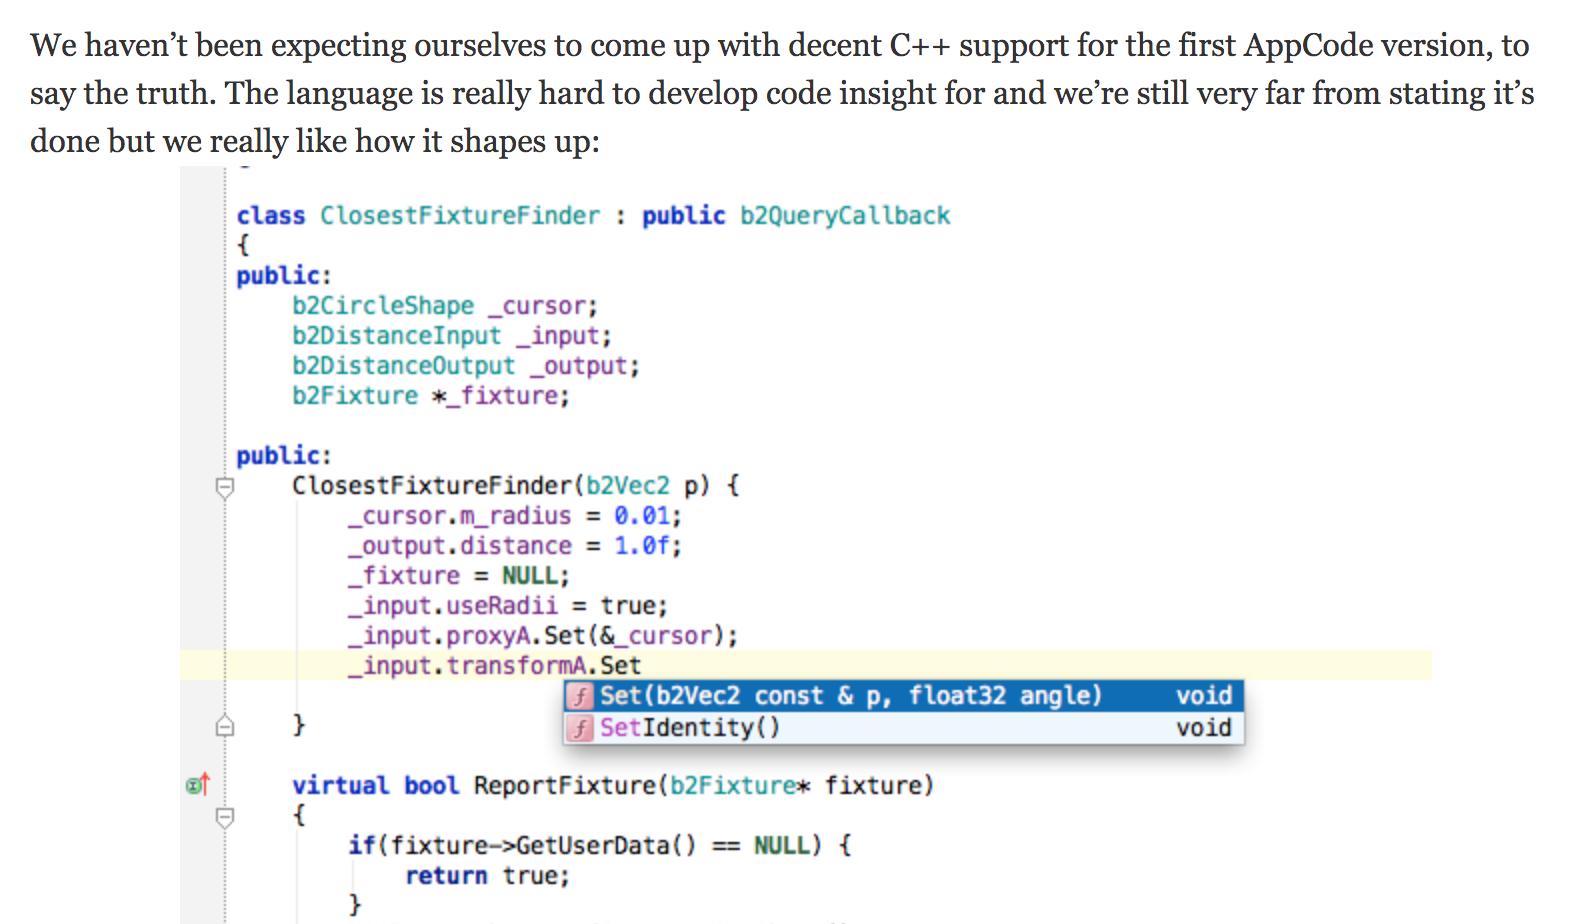 Prise en charge de C++ par AppCode